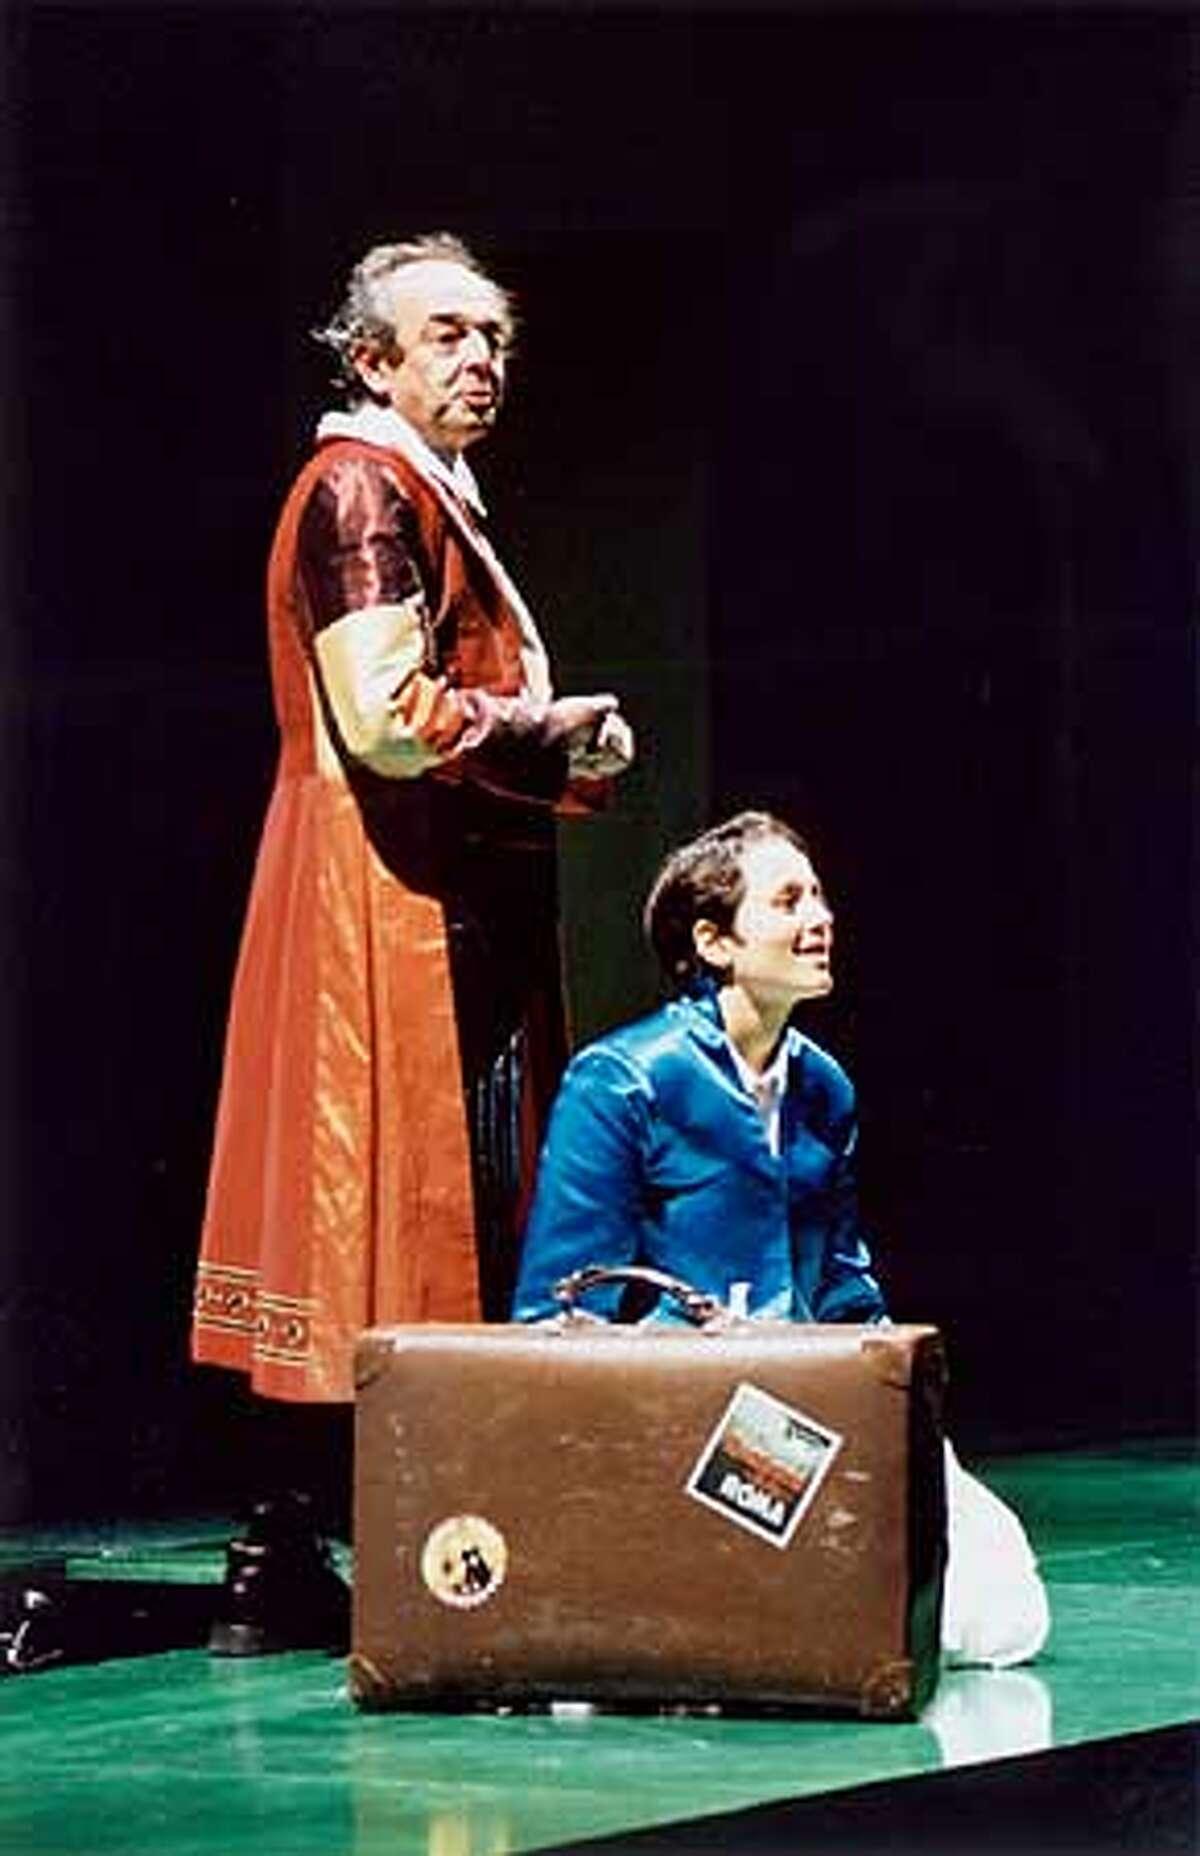 Dominique Serrand as the storyteller Rashad Khalifa and Nora El Samahy as Haroun Khalifa in Haroun and the Sea of Stories. Photo: Kevin Berne